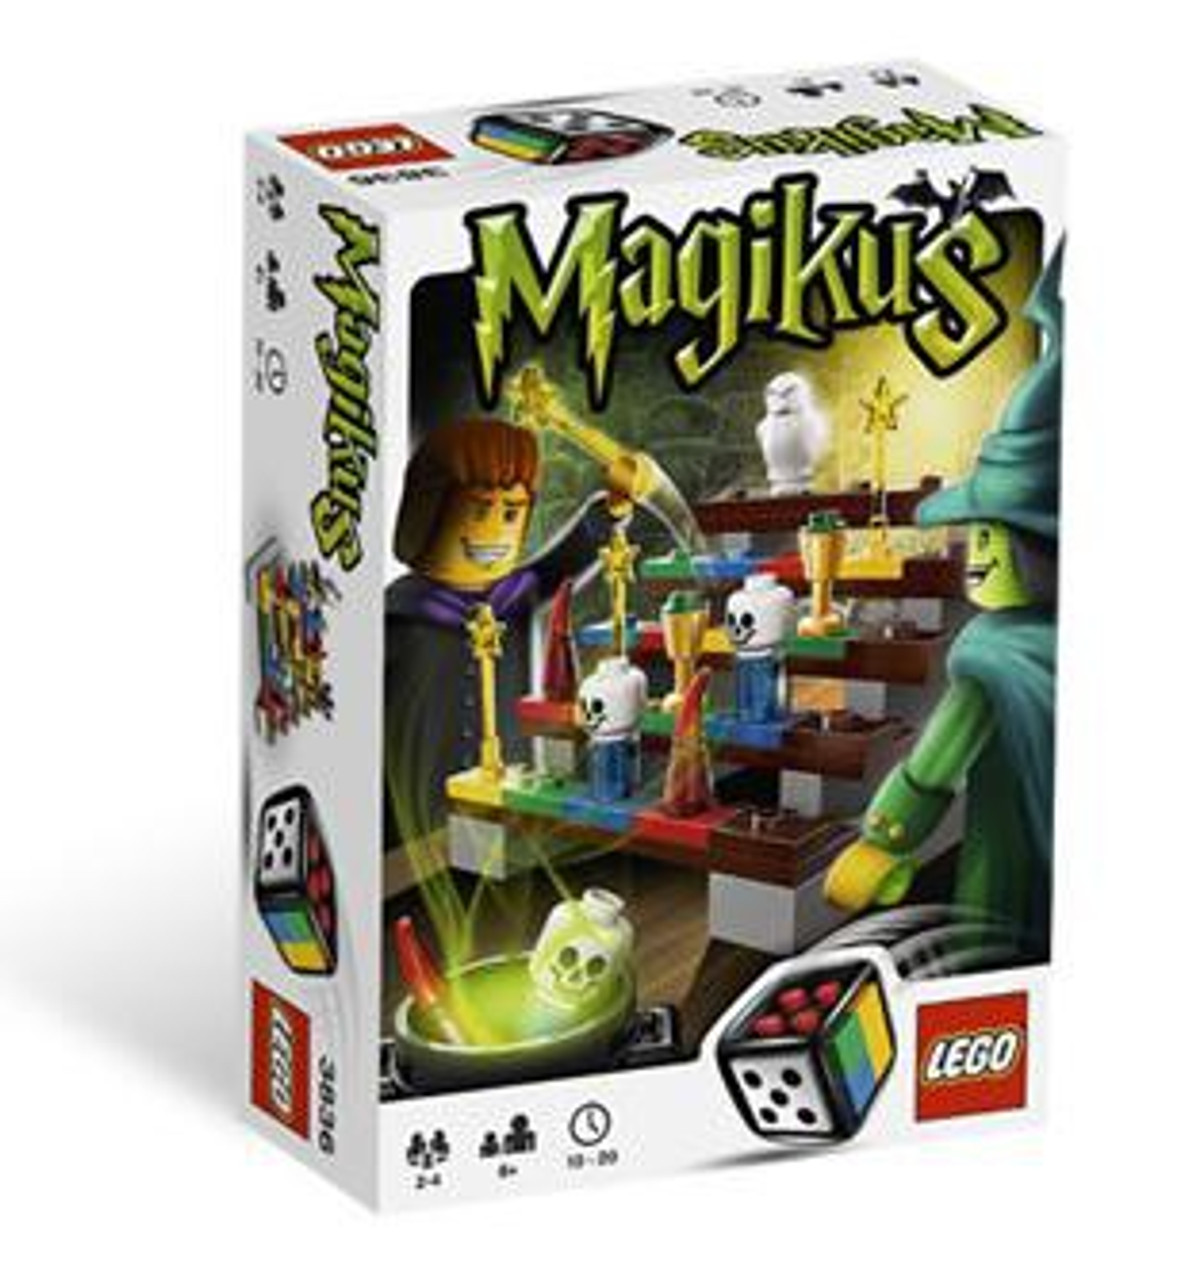 LEGO Games Magikus Board Game #3836